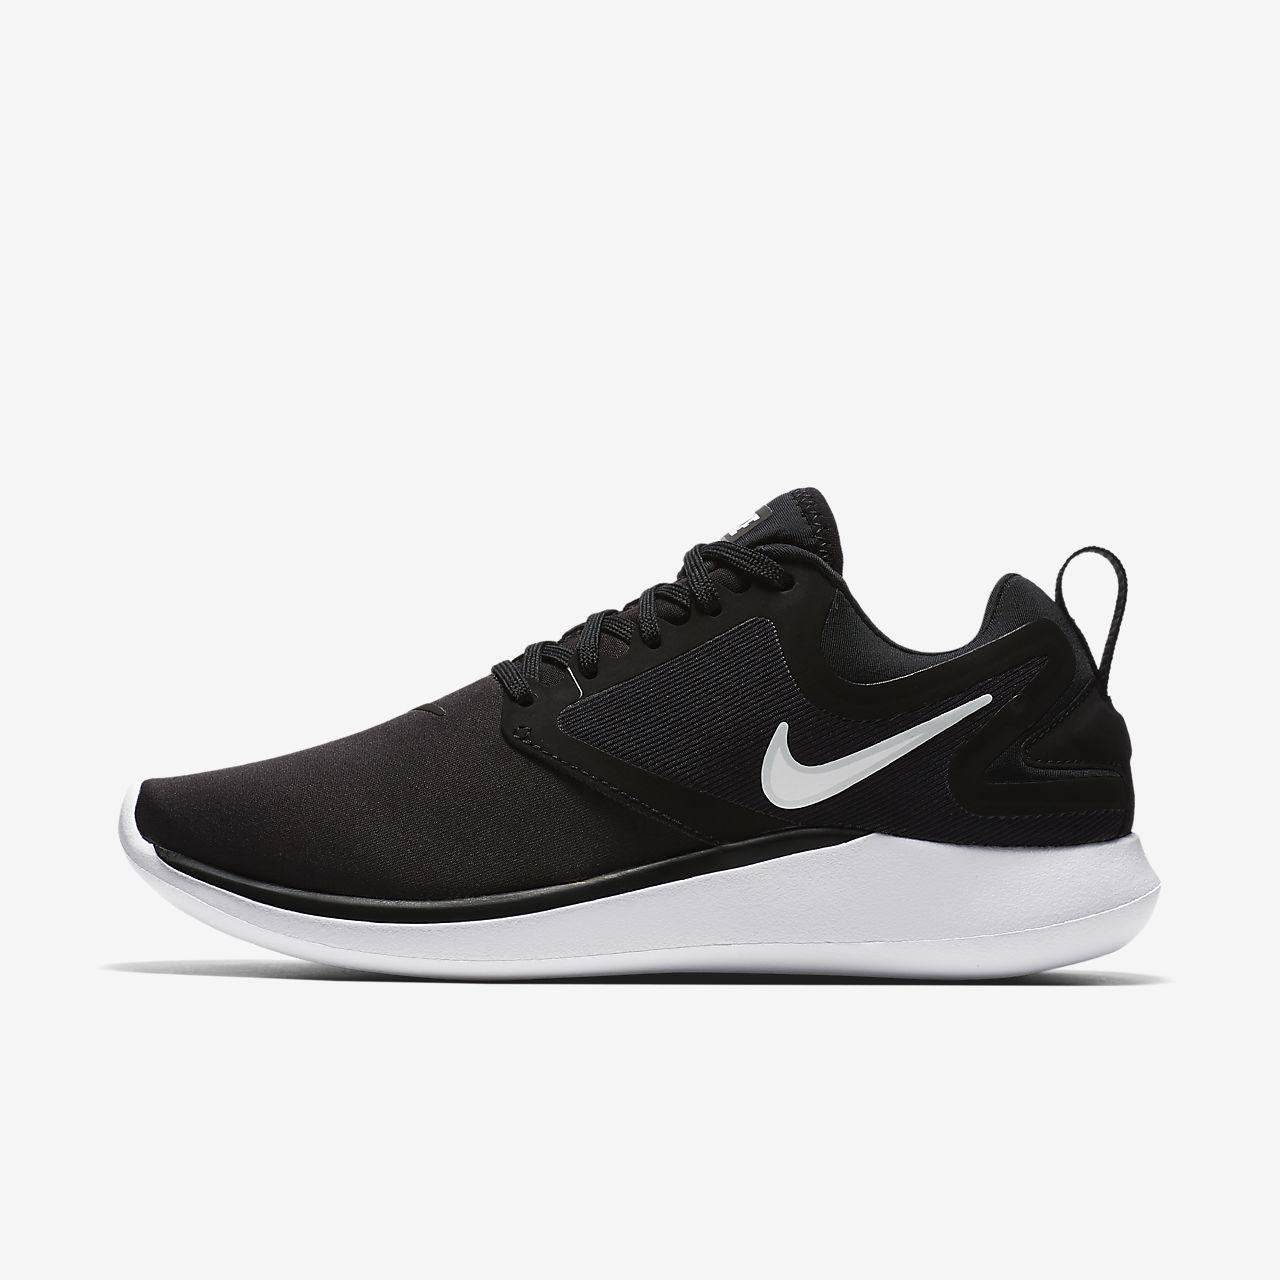 Nike WMNS Lunarsolo, Chaussures de Running Femme, Noir (Black/White/Anthracite 001), 36.5 EU